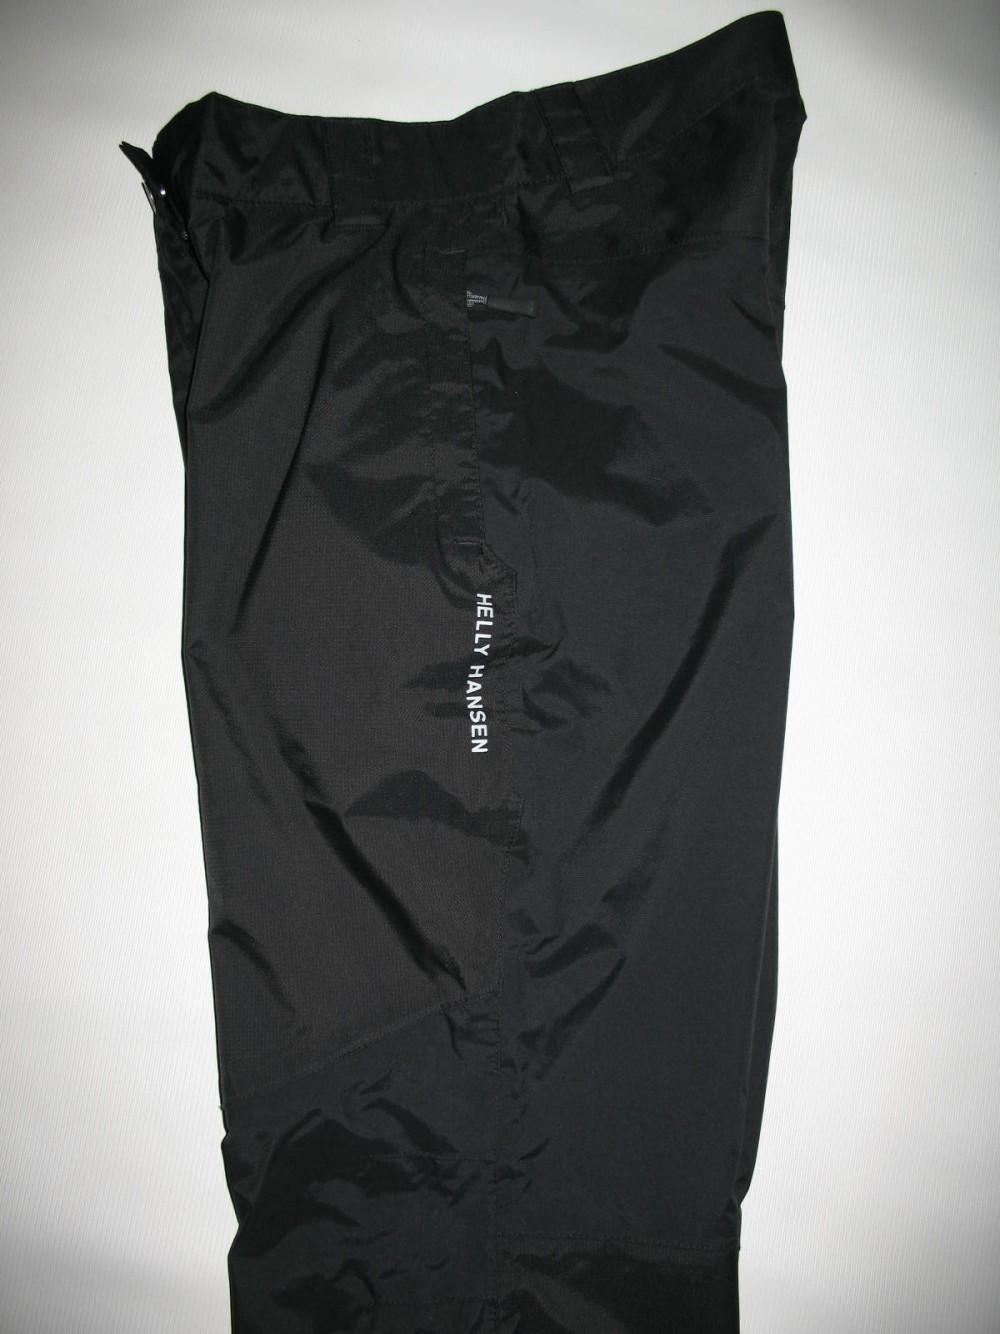 Штаны HELLY HANSEN hellytech packable pants lady (размер XS) - 7